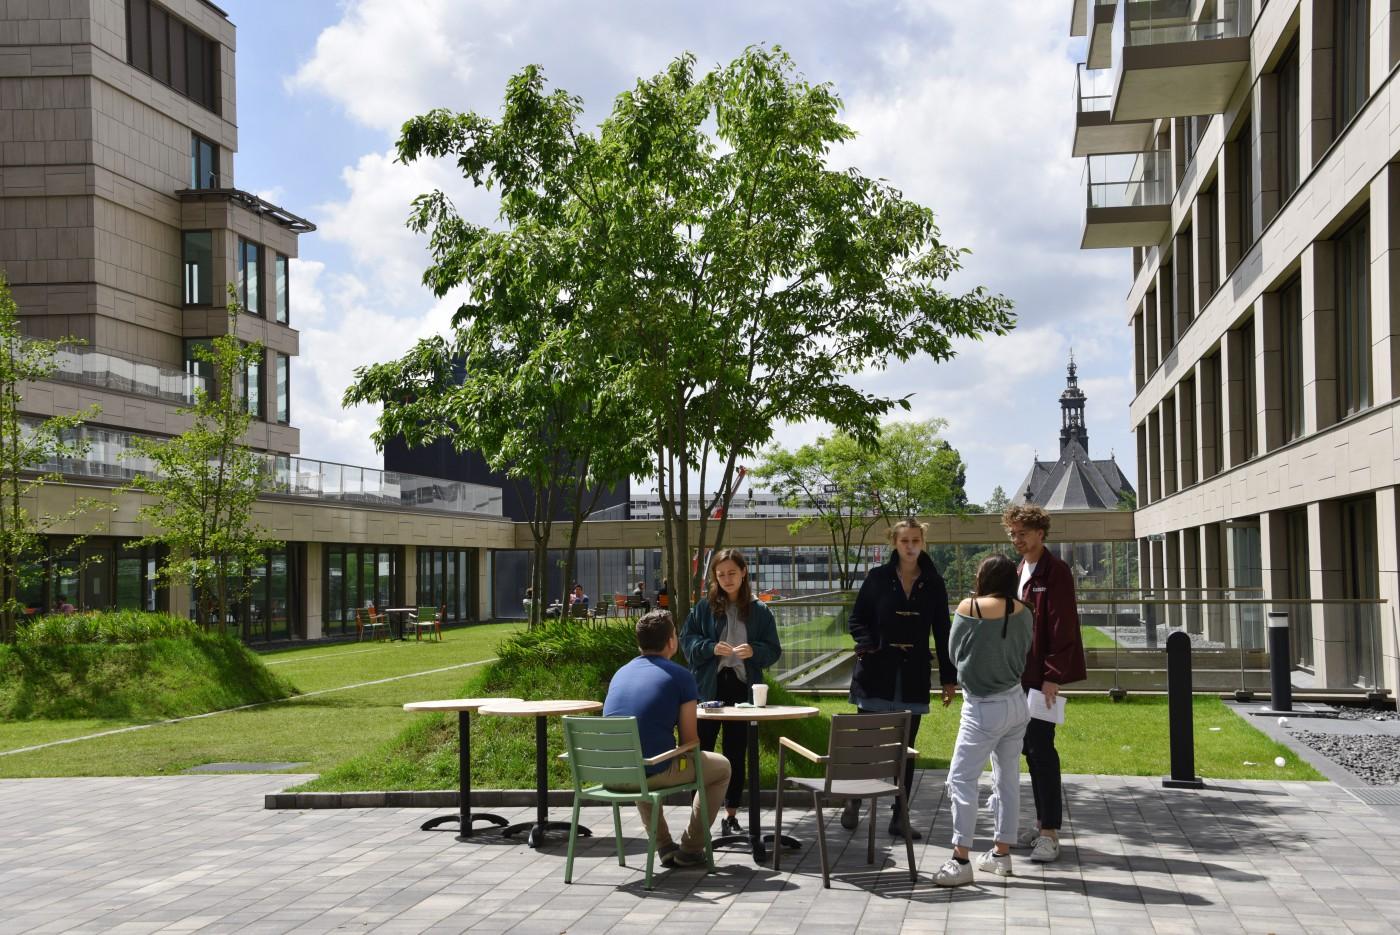 buro-sant-en-co-landschapsarchitectuur-campus-universiteit-leiden-wijnhavenkwartier-den haag-daktuin-1-bw